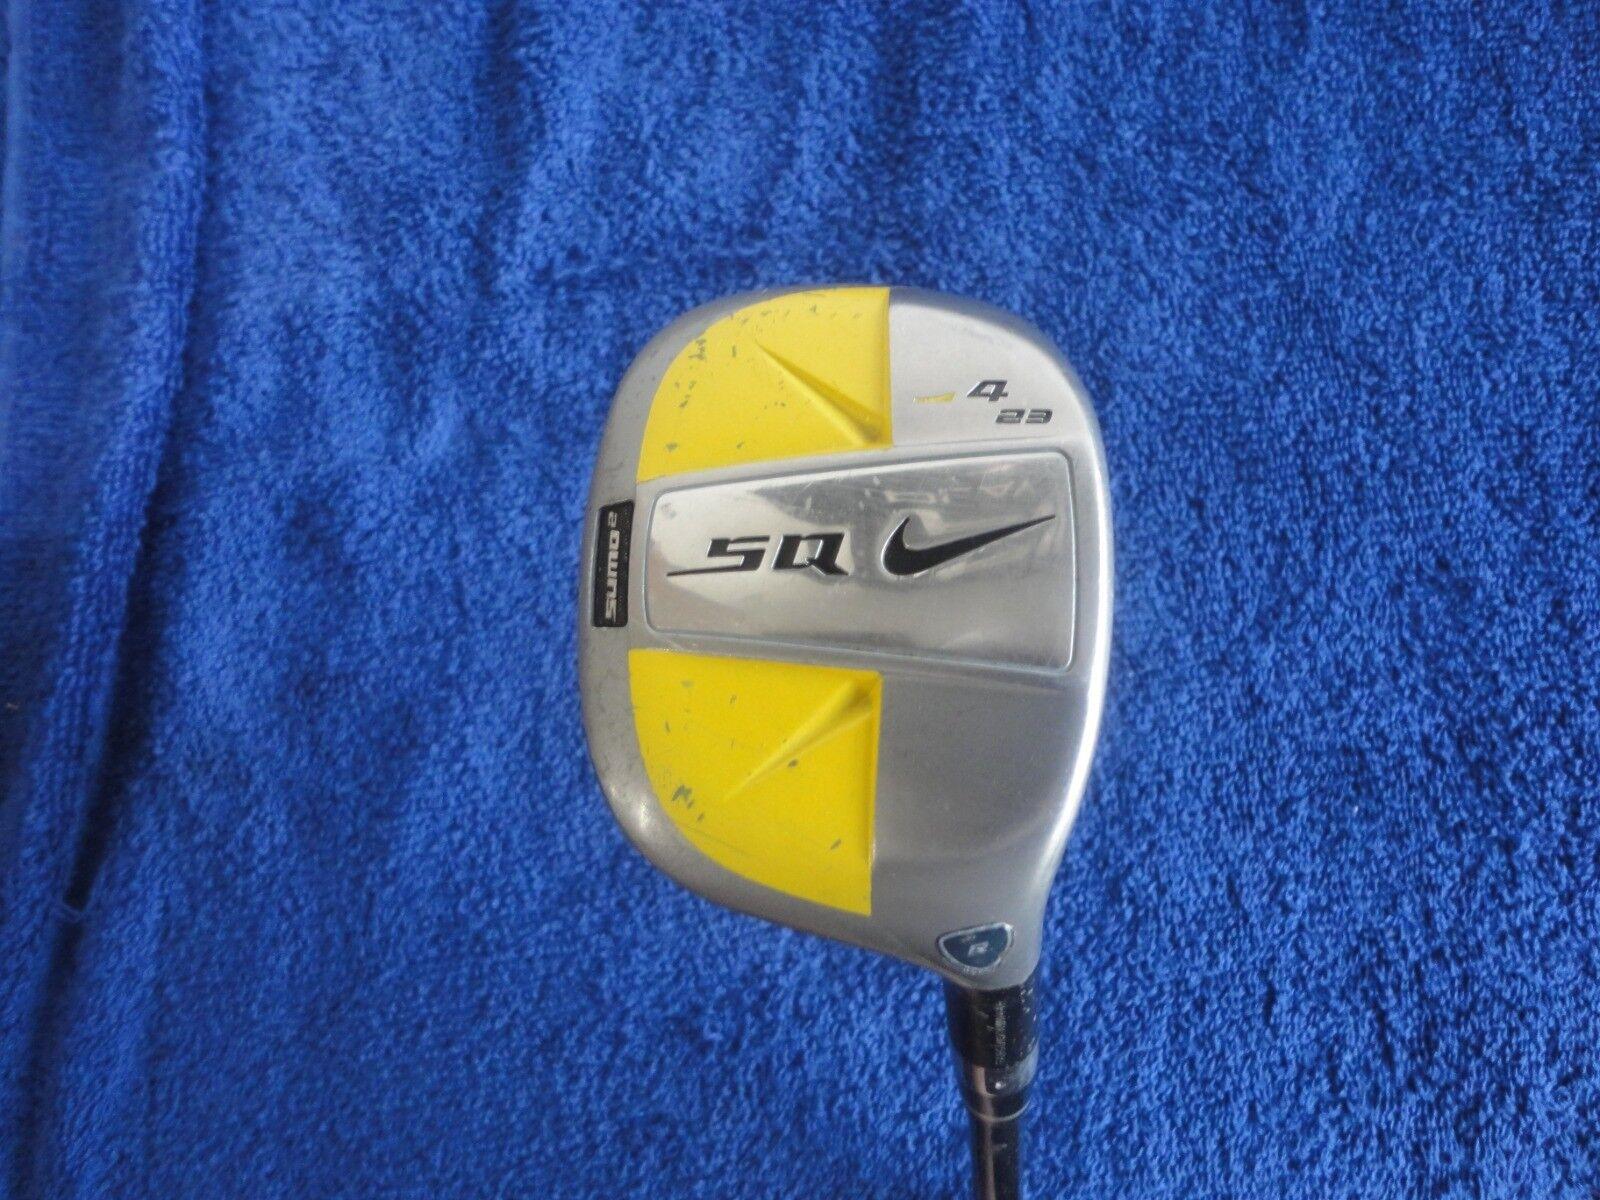 Nike Sq Sumo Squarojo  4 híbrido 23  , Grafito Regular, RH, (Z-392) hacer oferta  protección post-venta